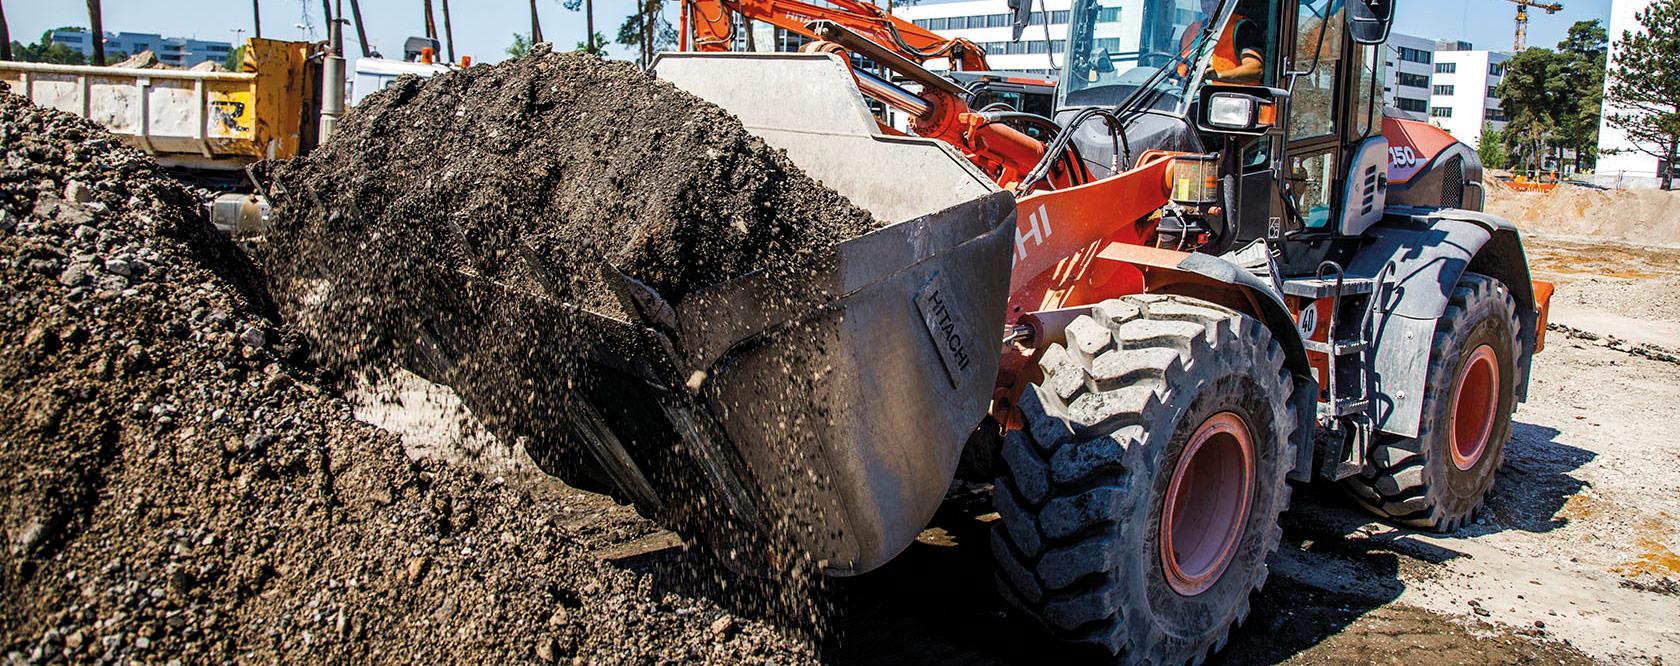 Hitachi buckets for wheel loaders and excavators